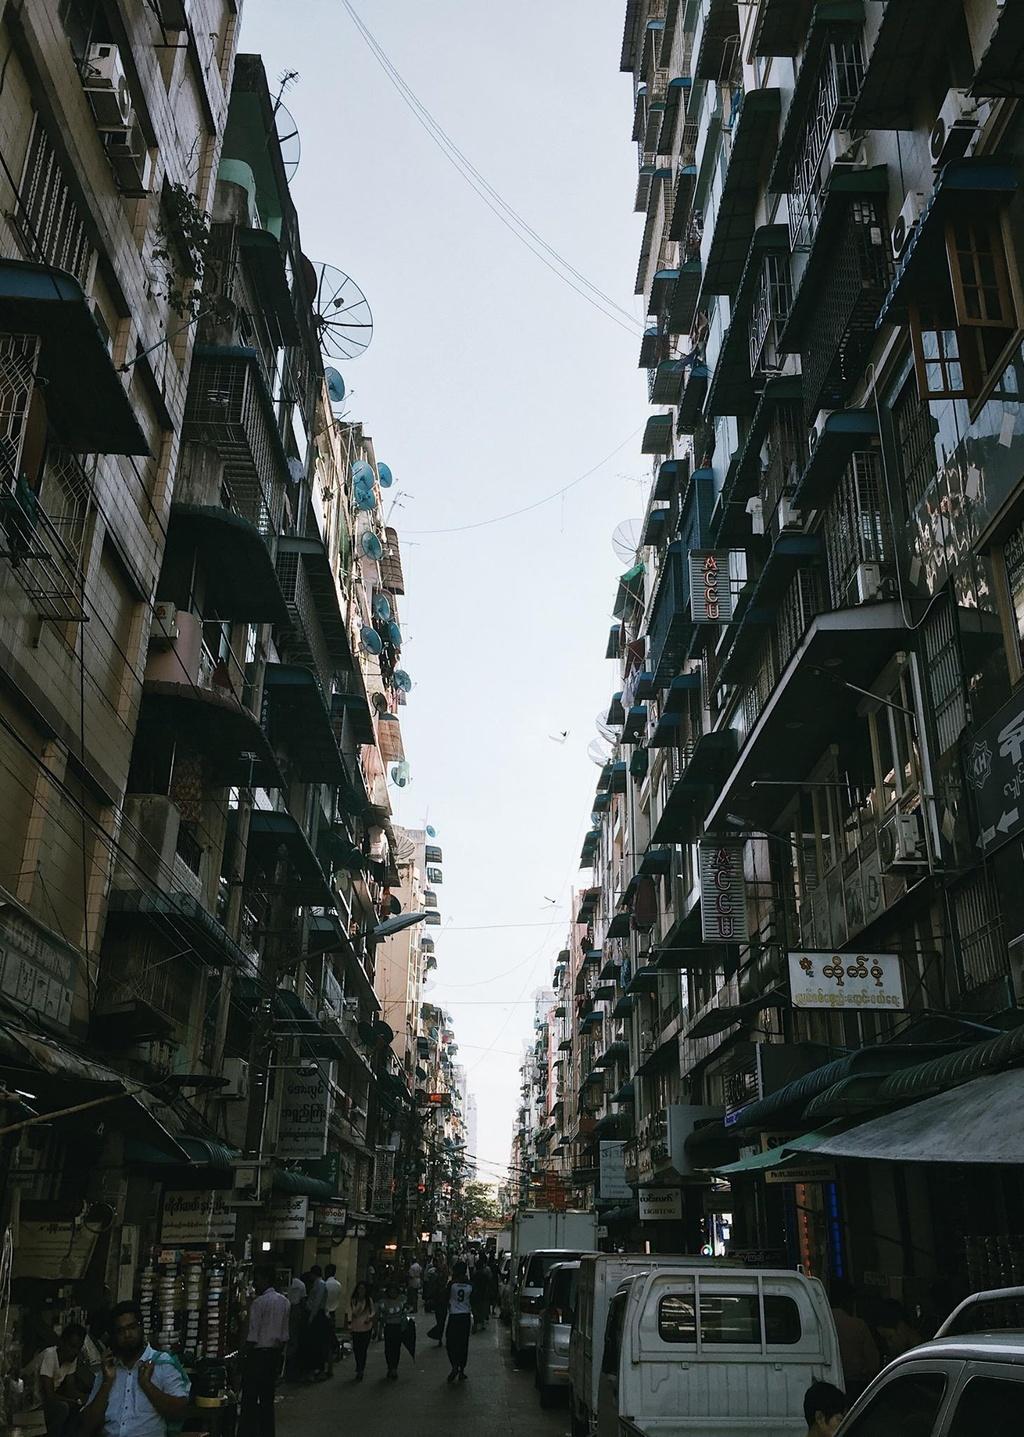 Kinh nghiem kham pha Myanmar anh 16